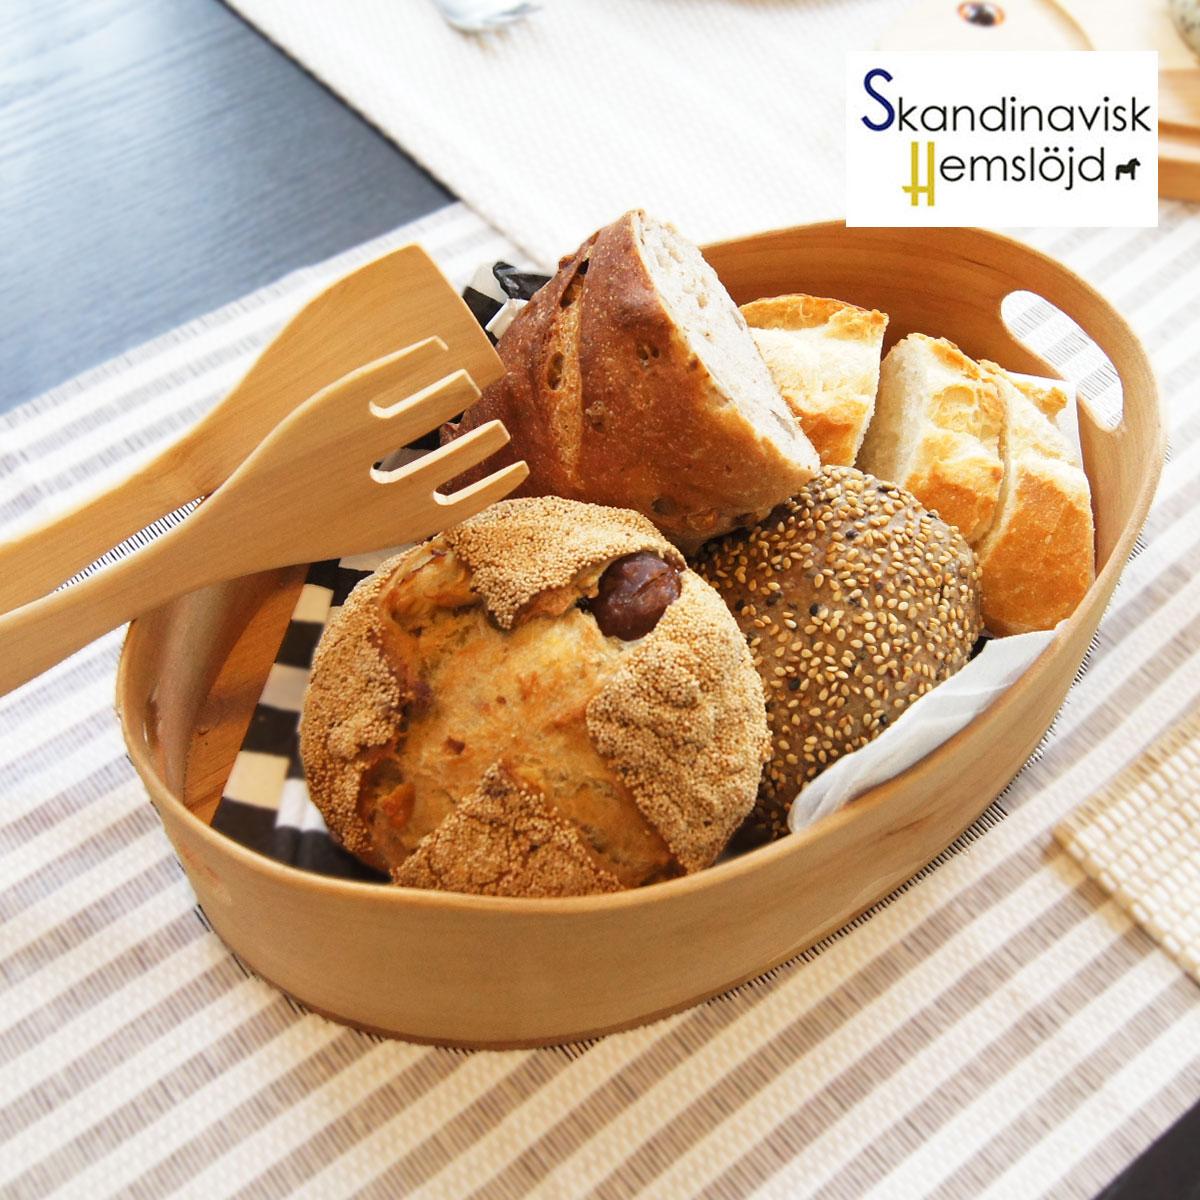 SkandinaviskH スカンジナヴィスク ブレッドバスケット 木製 おしゃれな北欧食器 職人の手作り スウェーデン 天然木 プレゼント 北欧カトラリー シンプルで美しいデザイン キッチン雑貨 ナチュラルなキッチン雑貨はプレゼントやギフトにも人気 インテリアにも